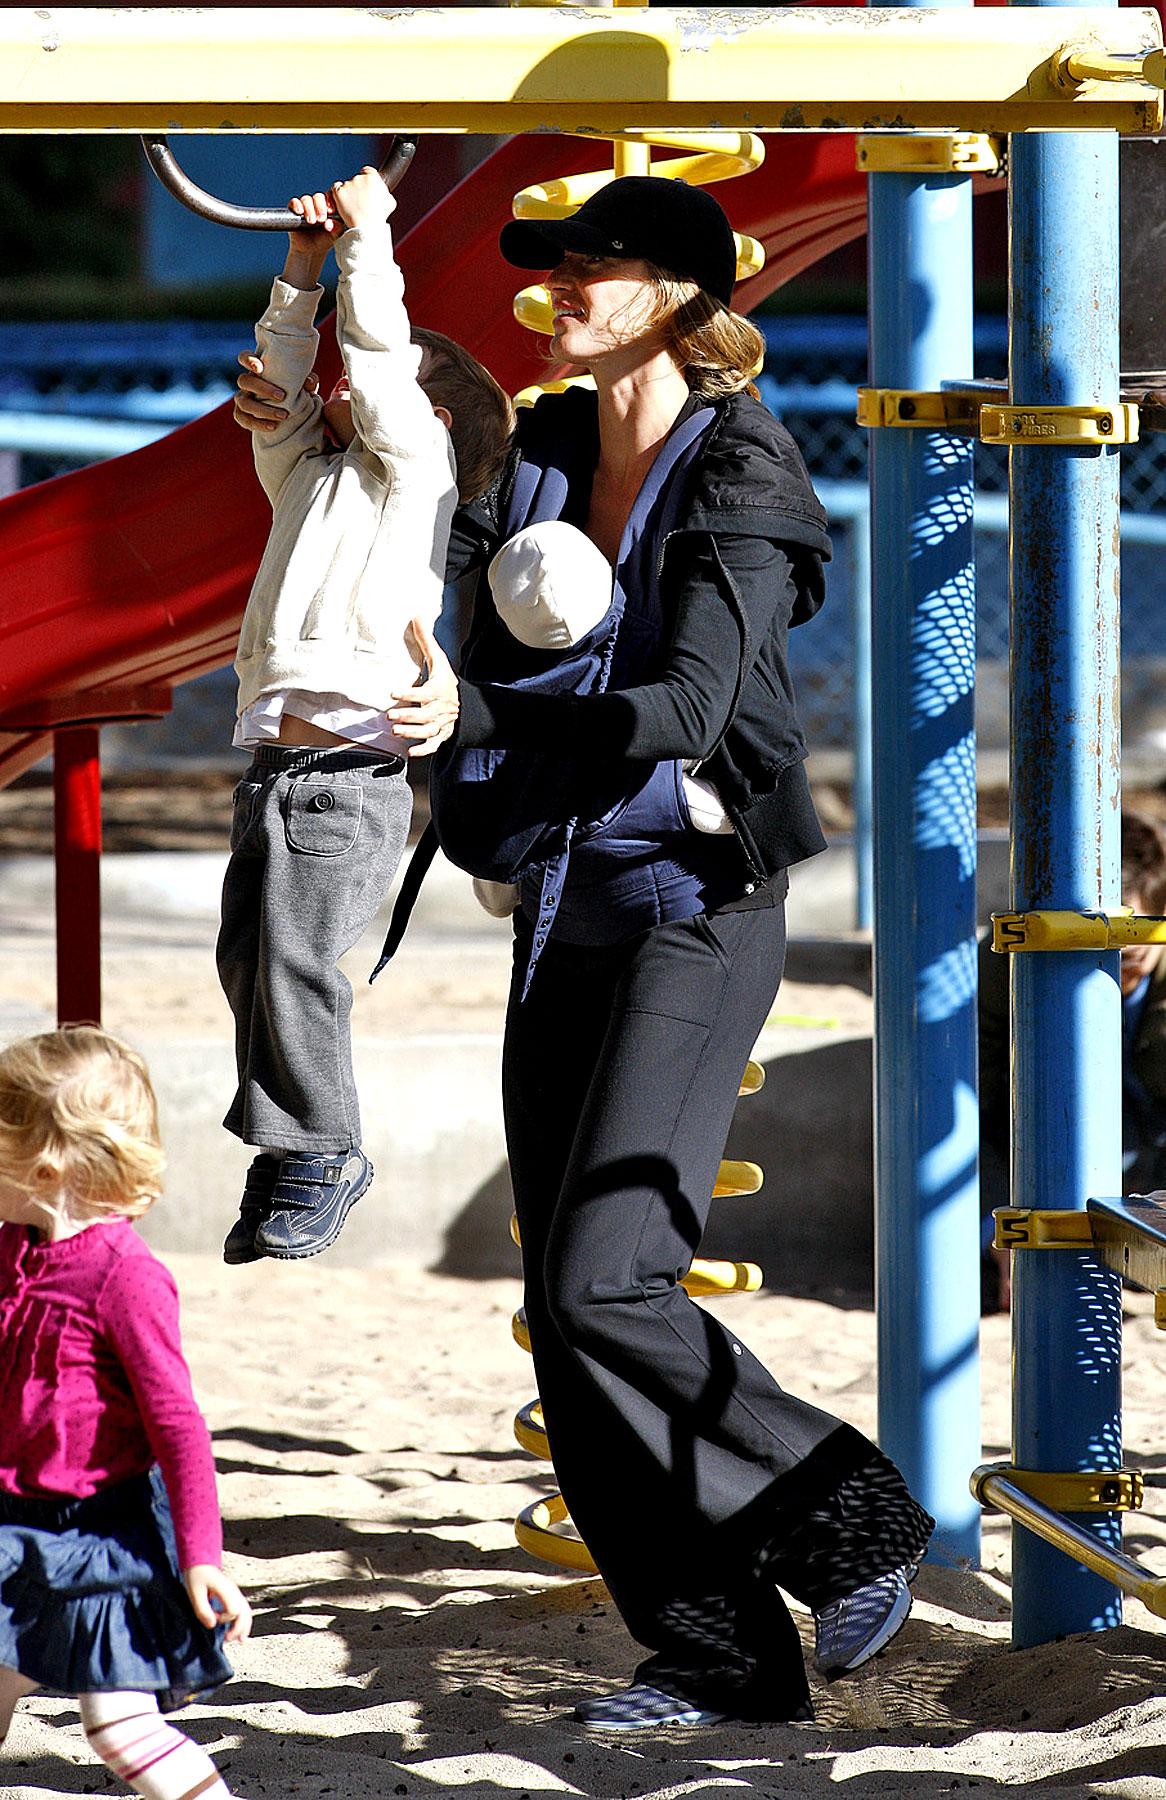 Tom Brady and Gisele Bundchen's Family Playground Day (PHOTOS)